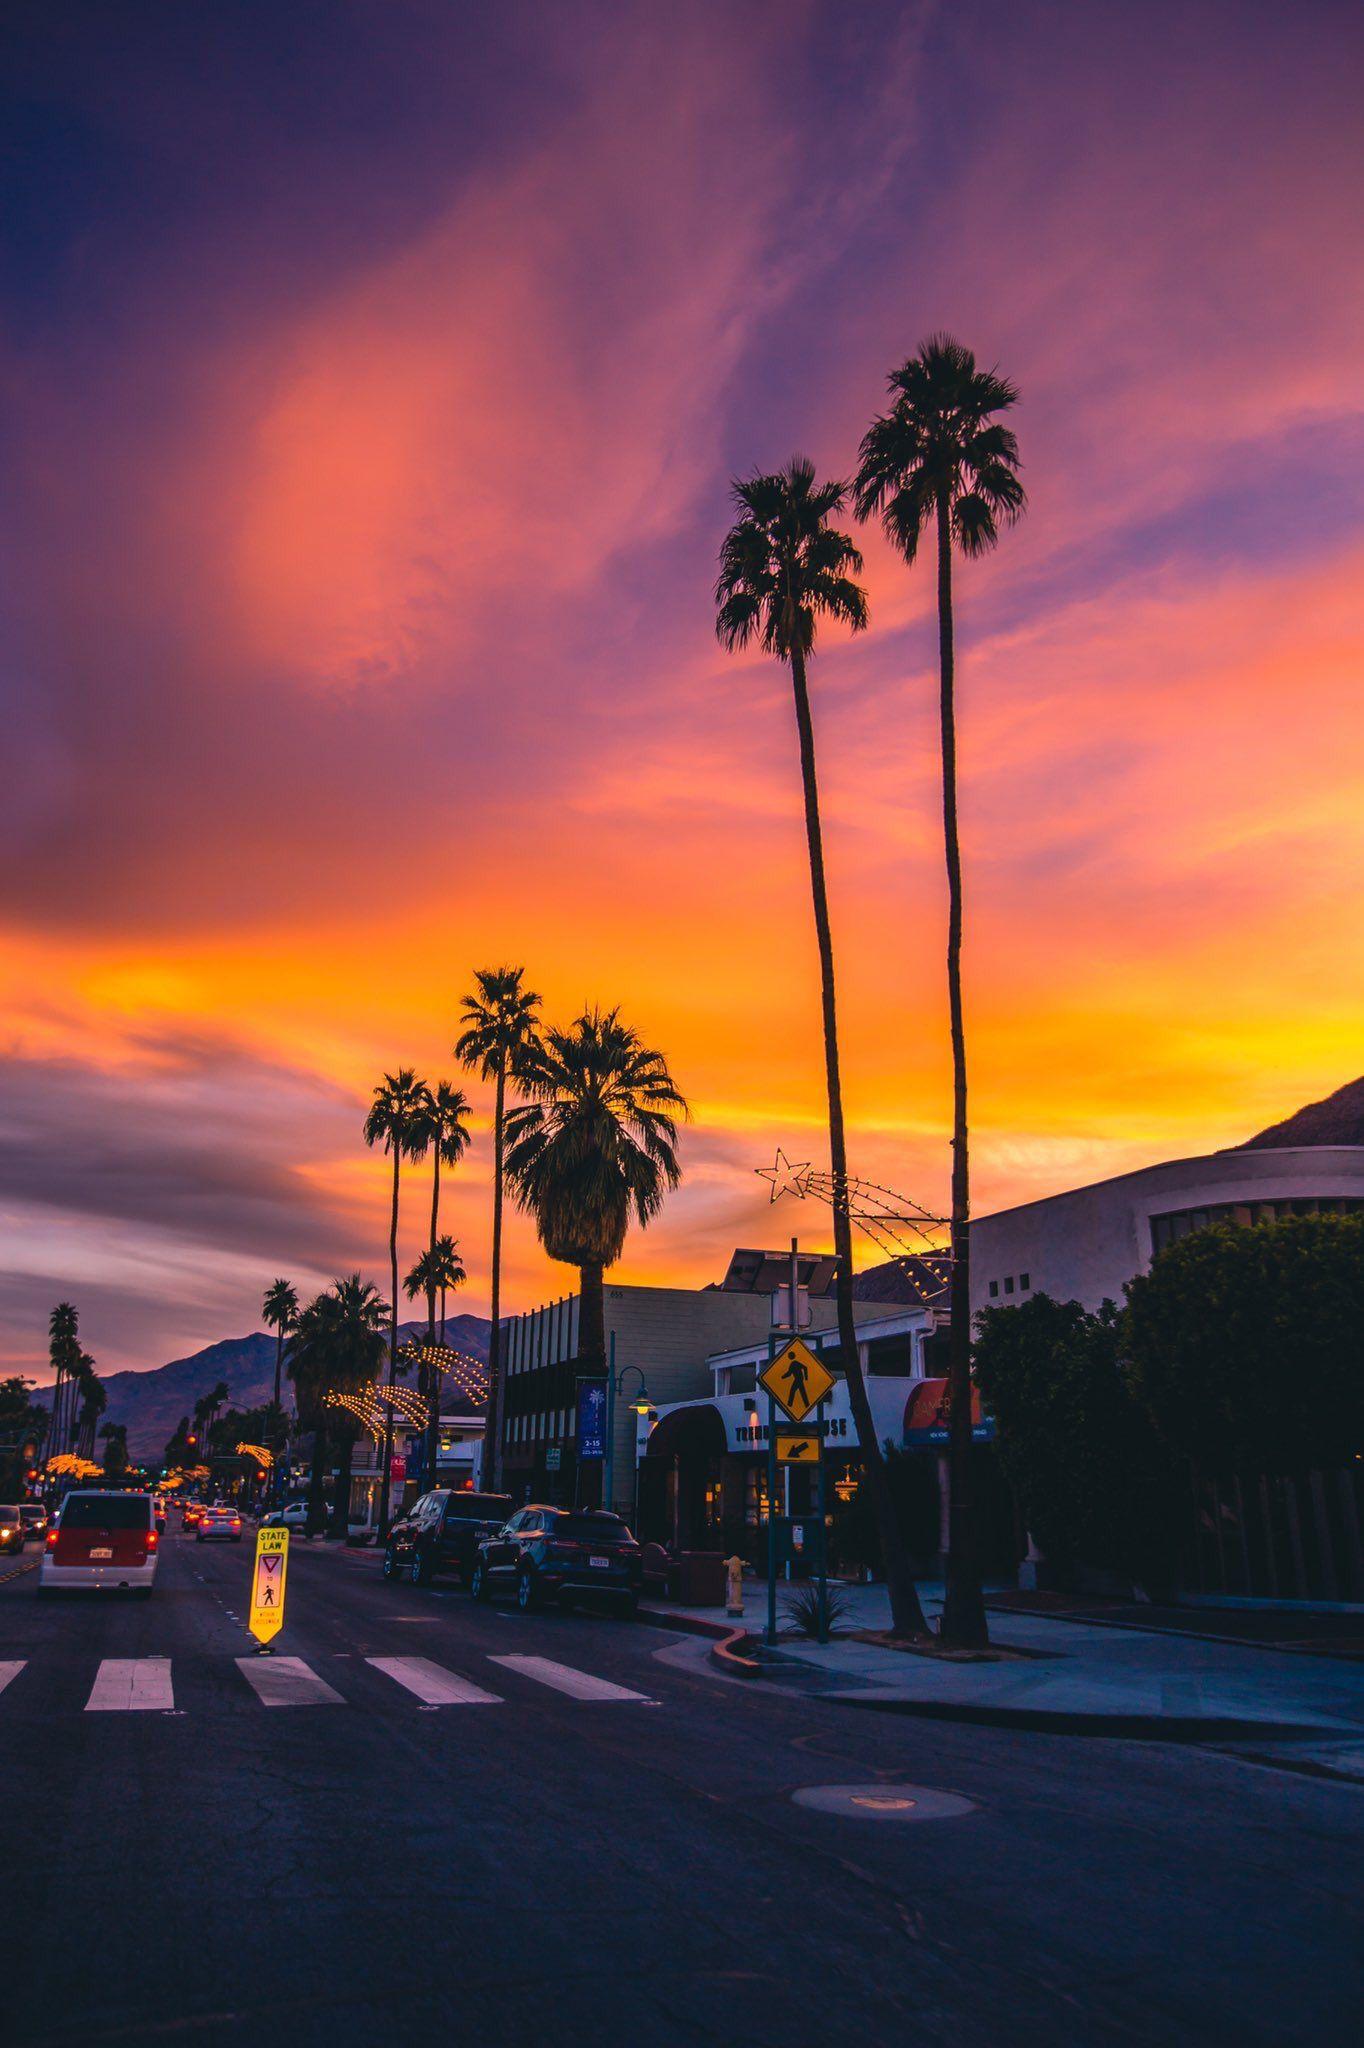 Iphone Aesthetic California Aesthetic Sunset Wallpaper 1364x2048